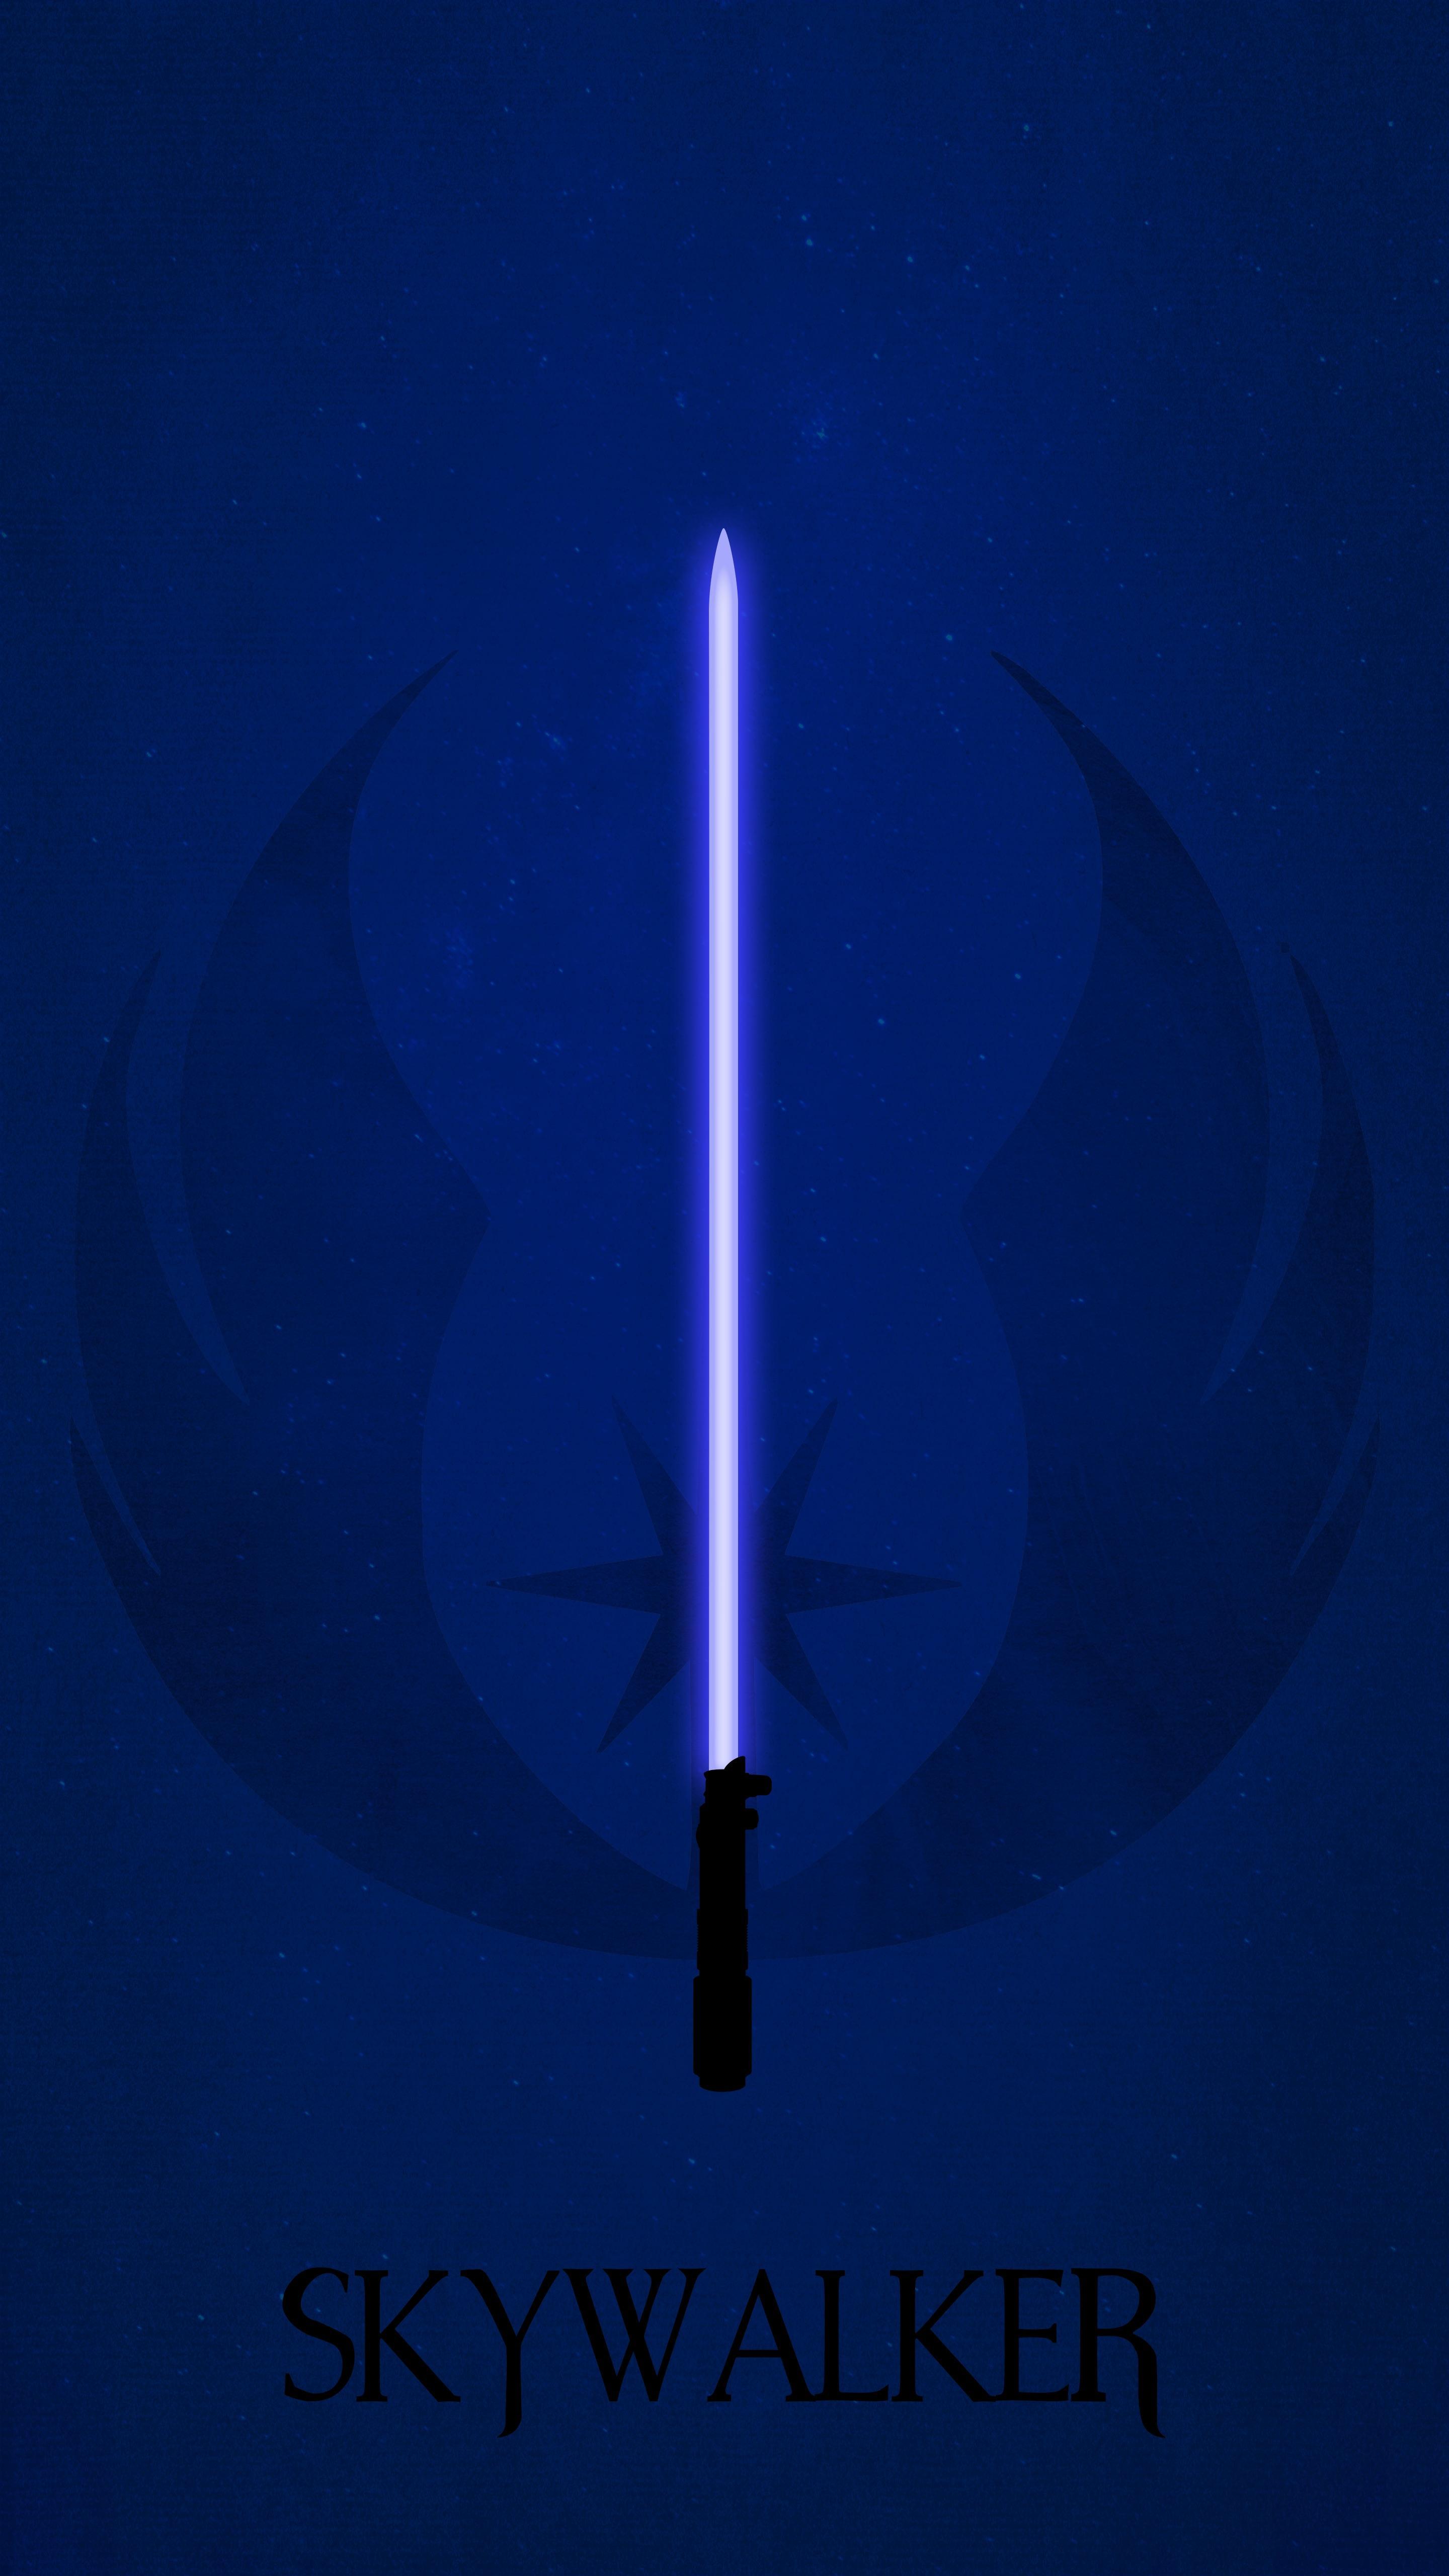 Star Wars Phone Wallpaper Lightsaber 2880x5120 Wallpaper Teahub Io